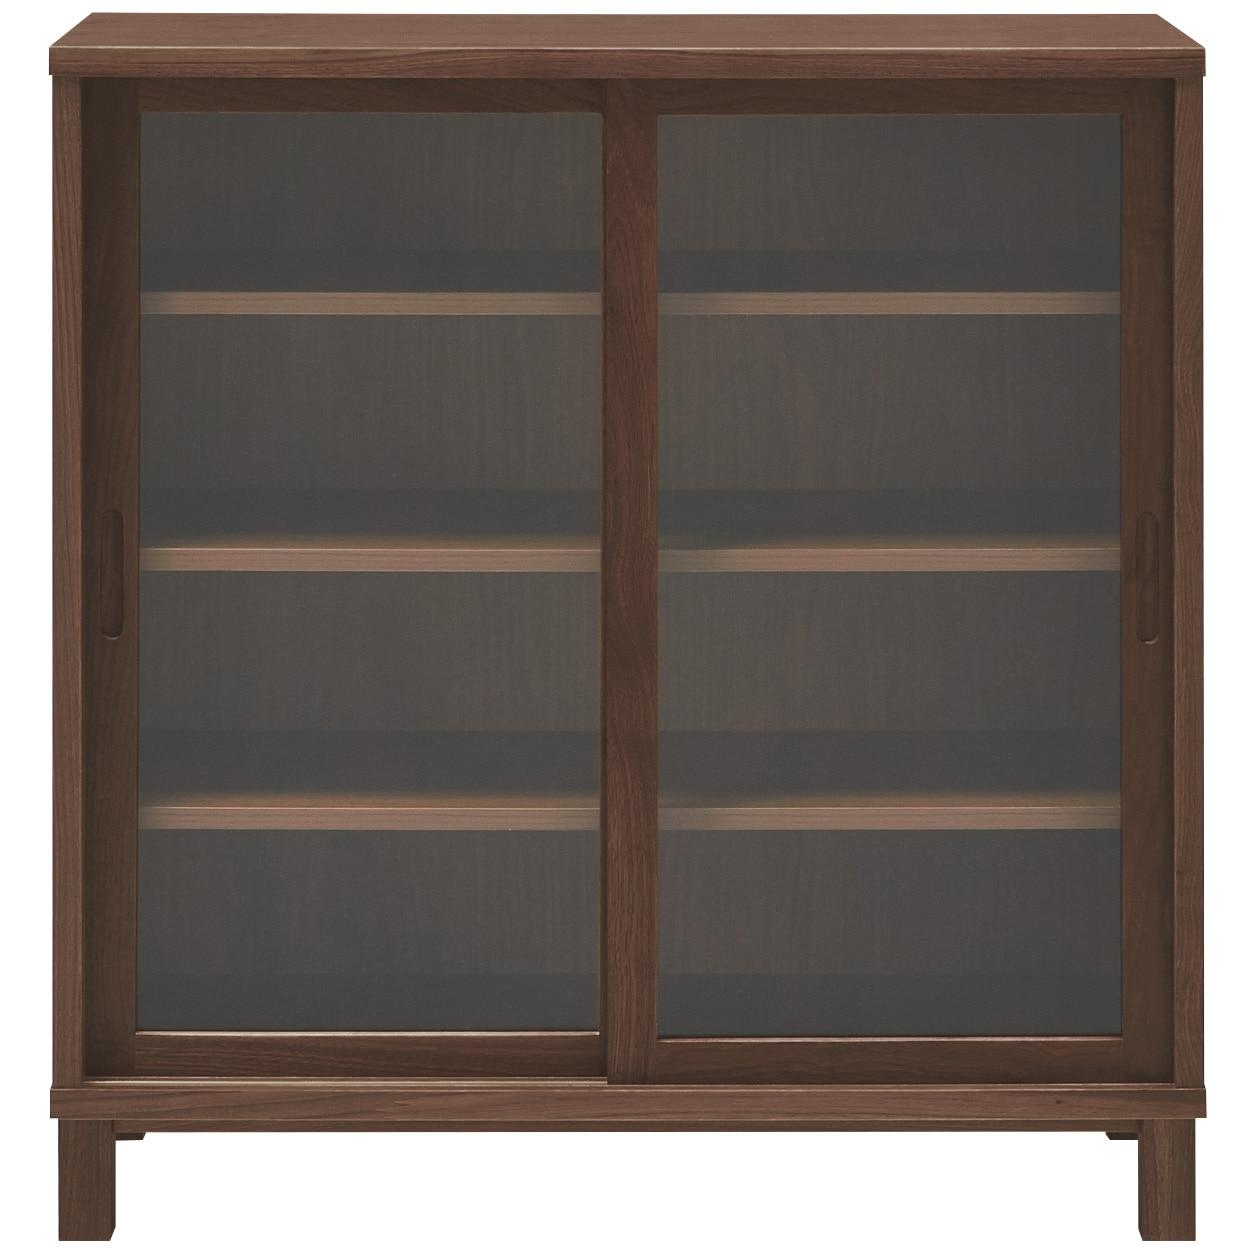 Walnut Wood Cabinet With Sliding Glass Door Muji